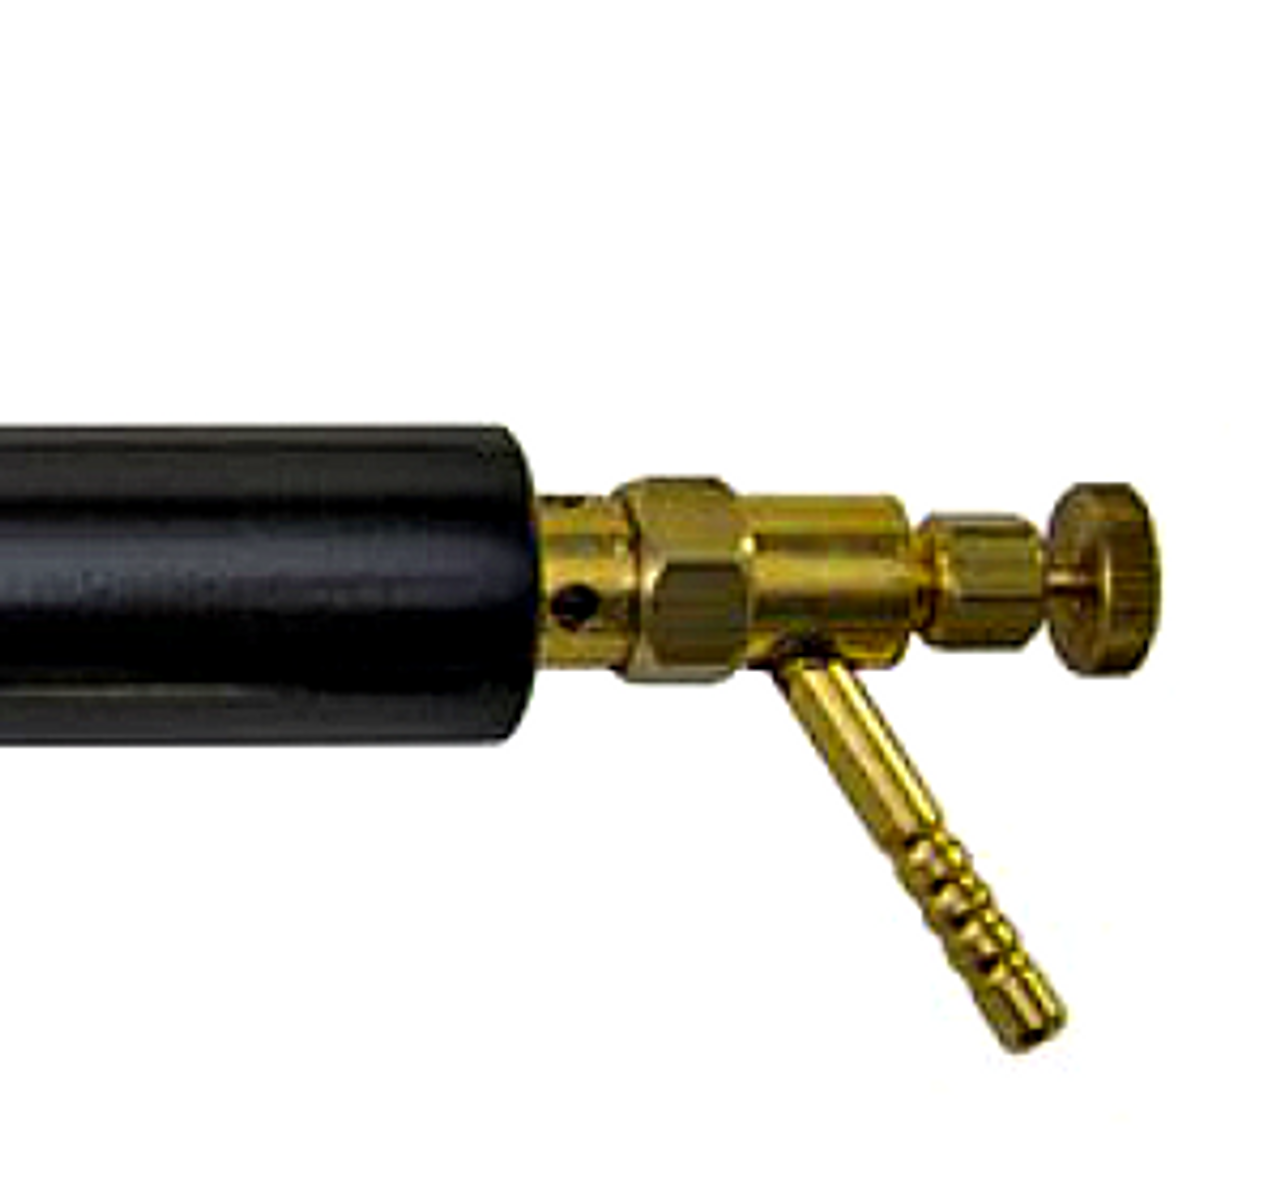 Acetylene-Soldering-IronTorch-Slip-On-Connection